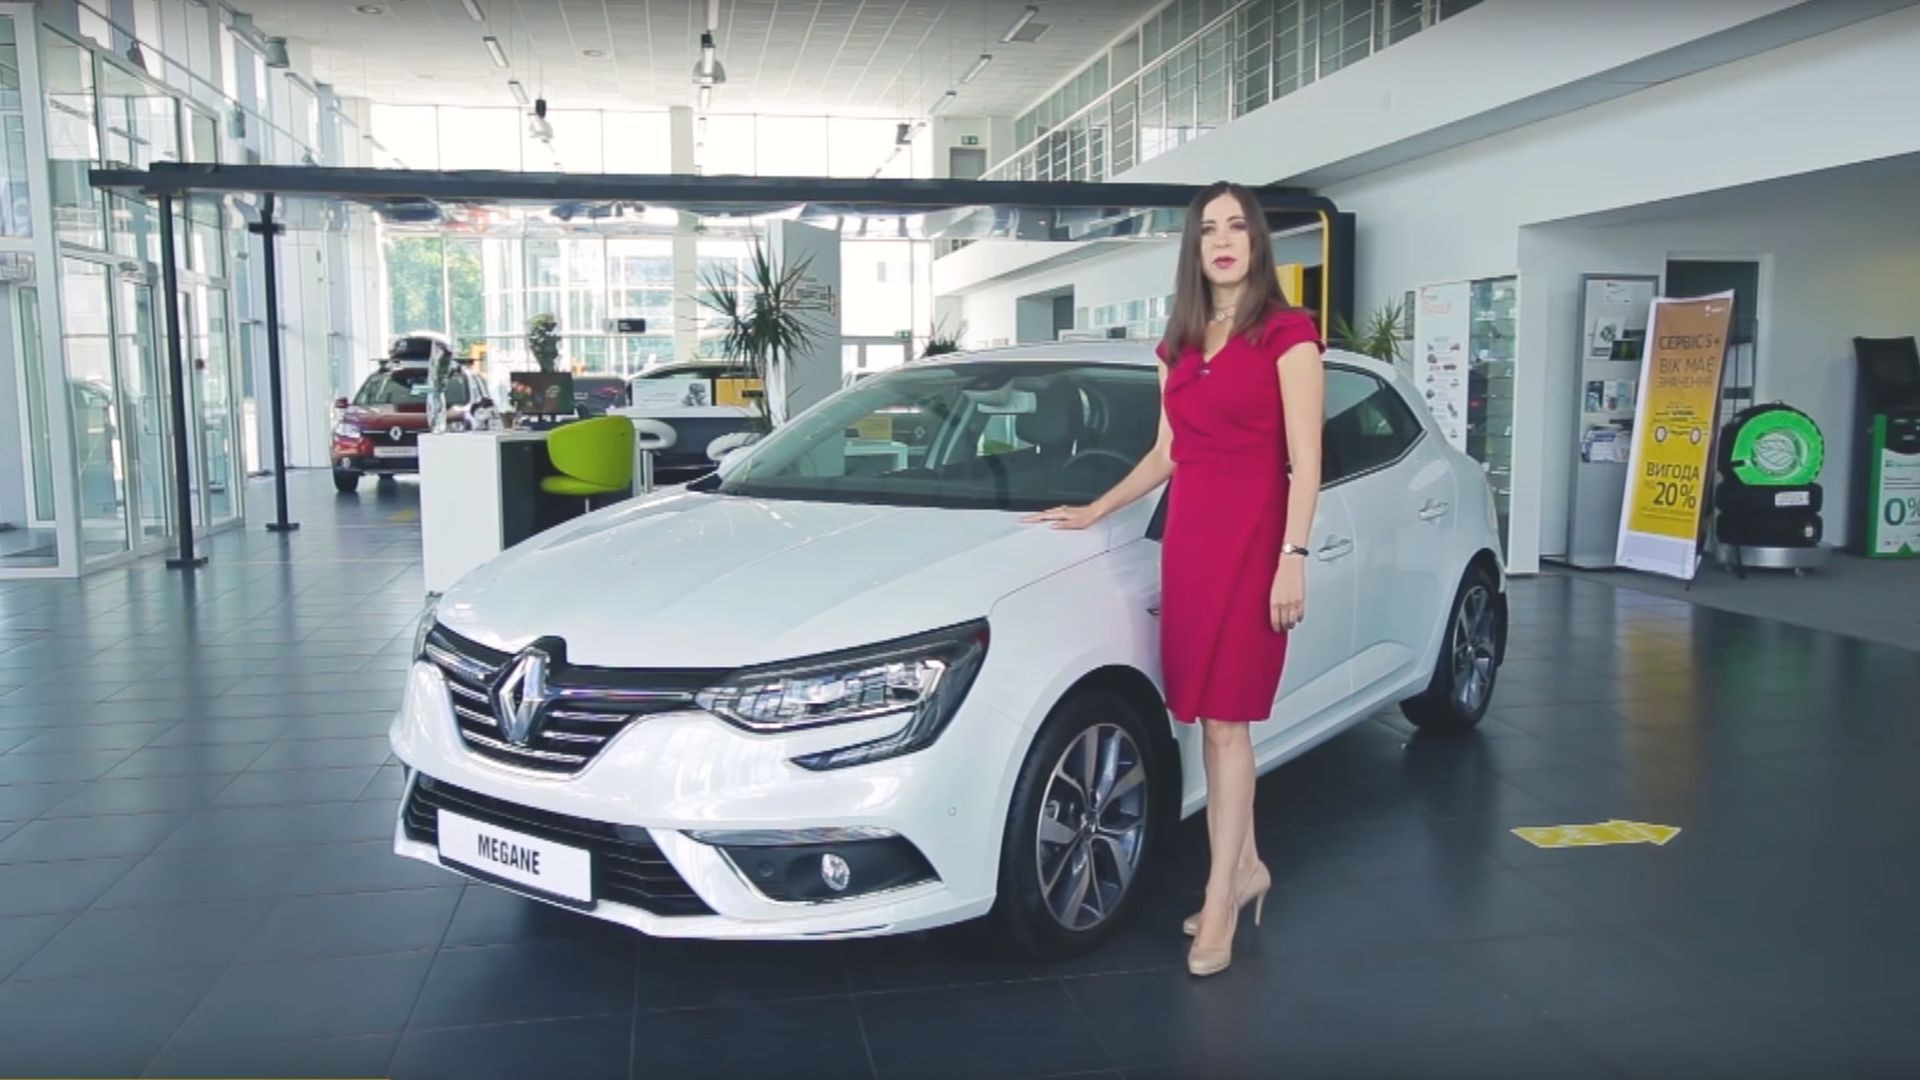 Віртуальний шоу-рум Renault Megane